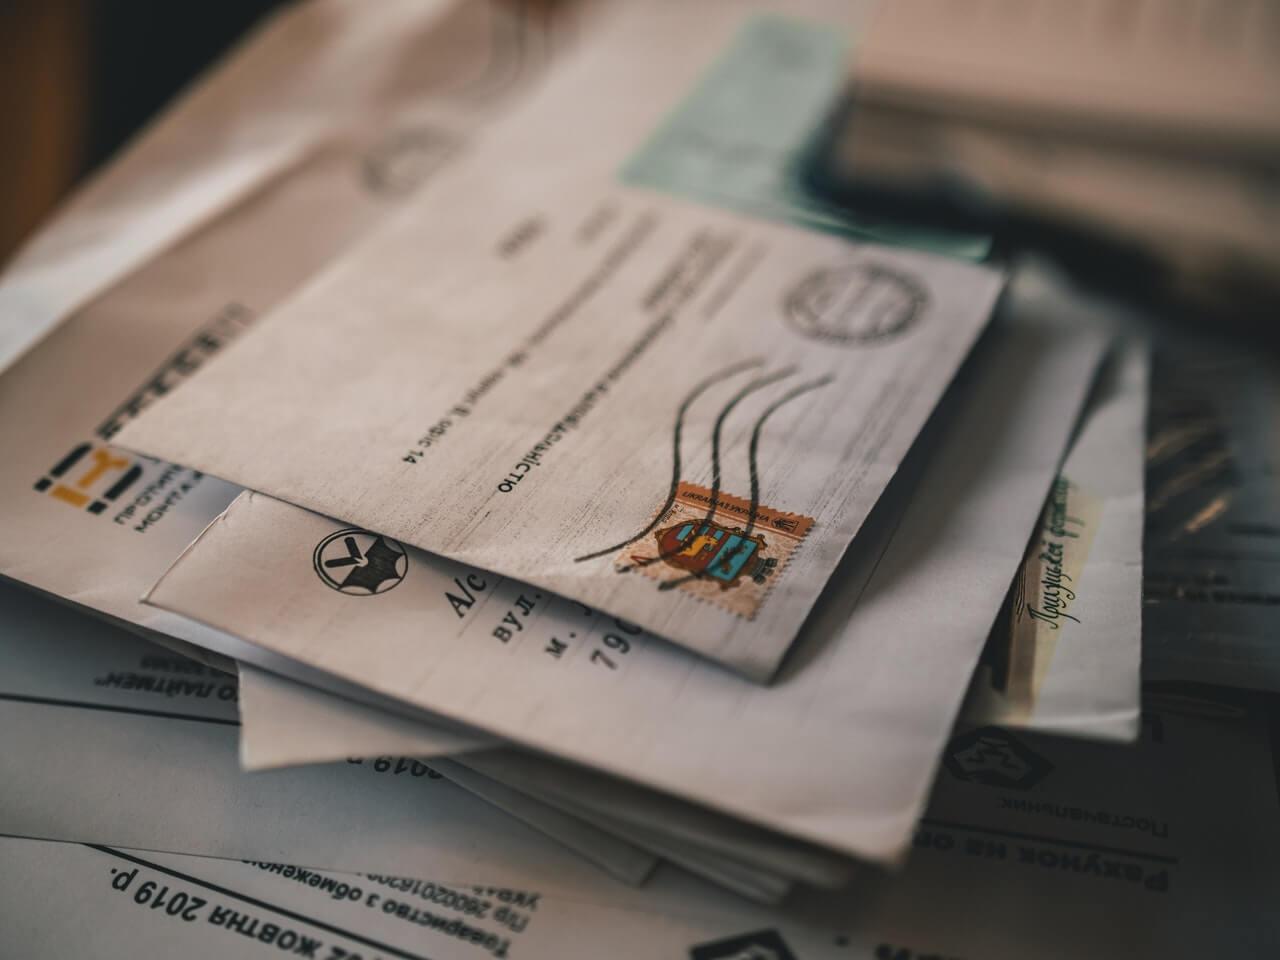 stamps on envelopes